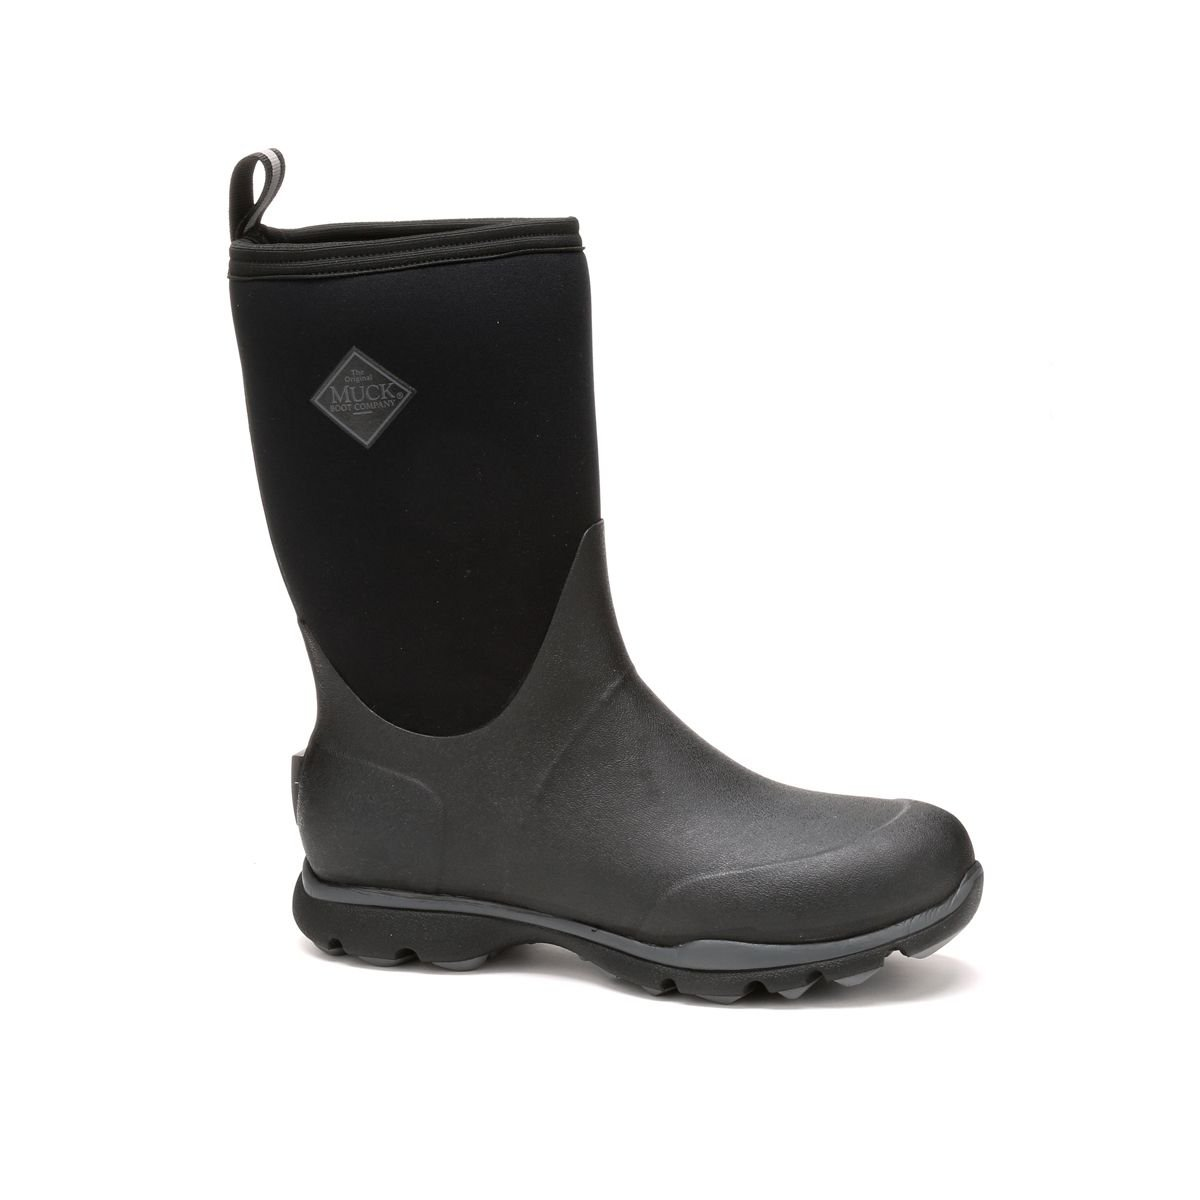 Muck Boot Men's Arctic Excursion Mid Snow Boot, Black/Gray, 15 US/15-15.5 M US